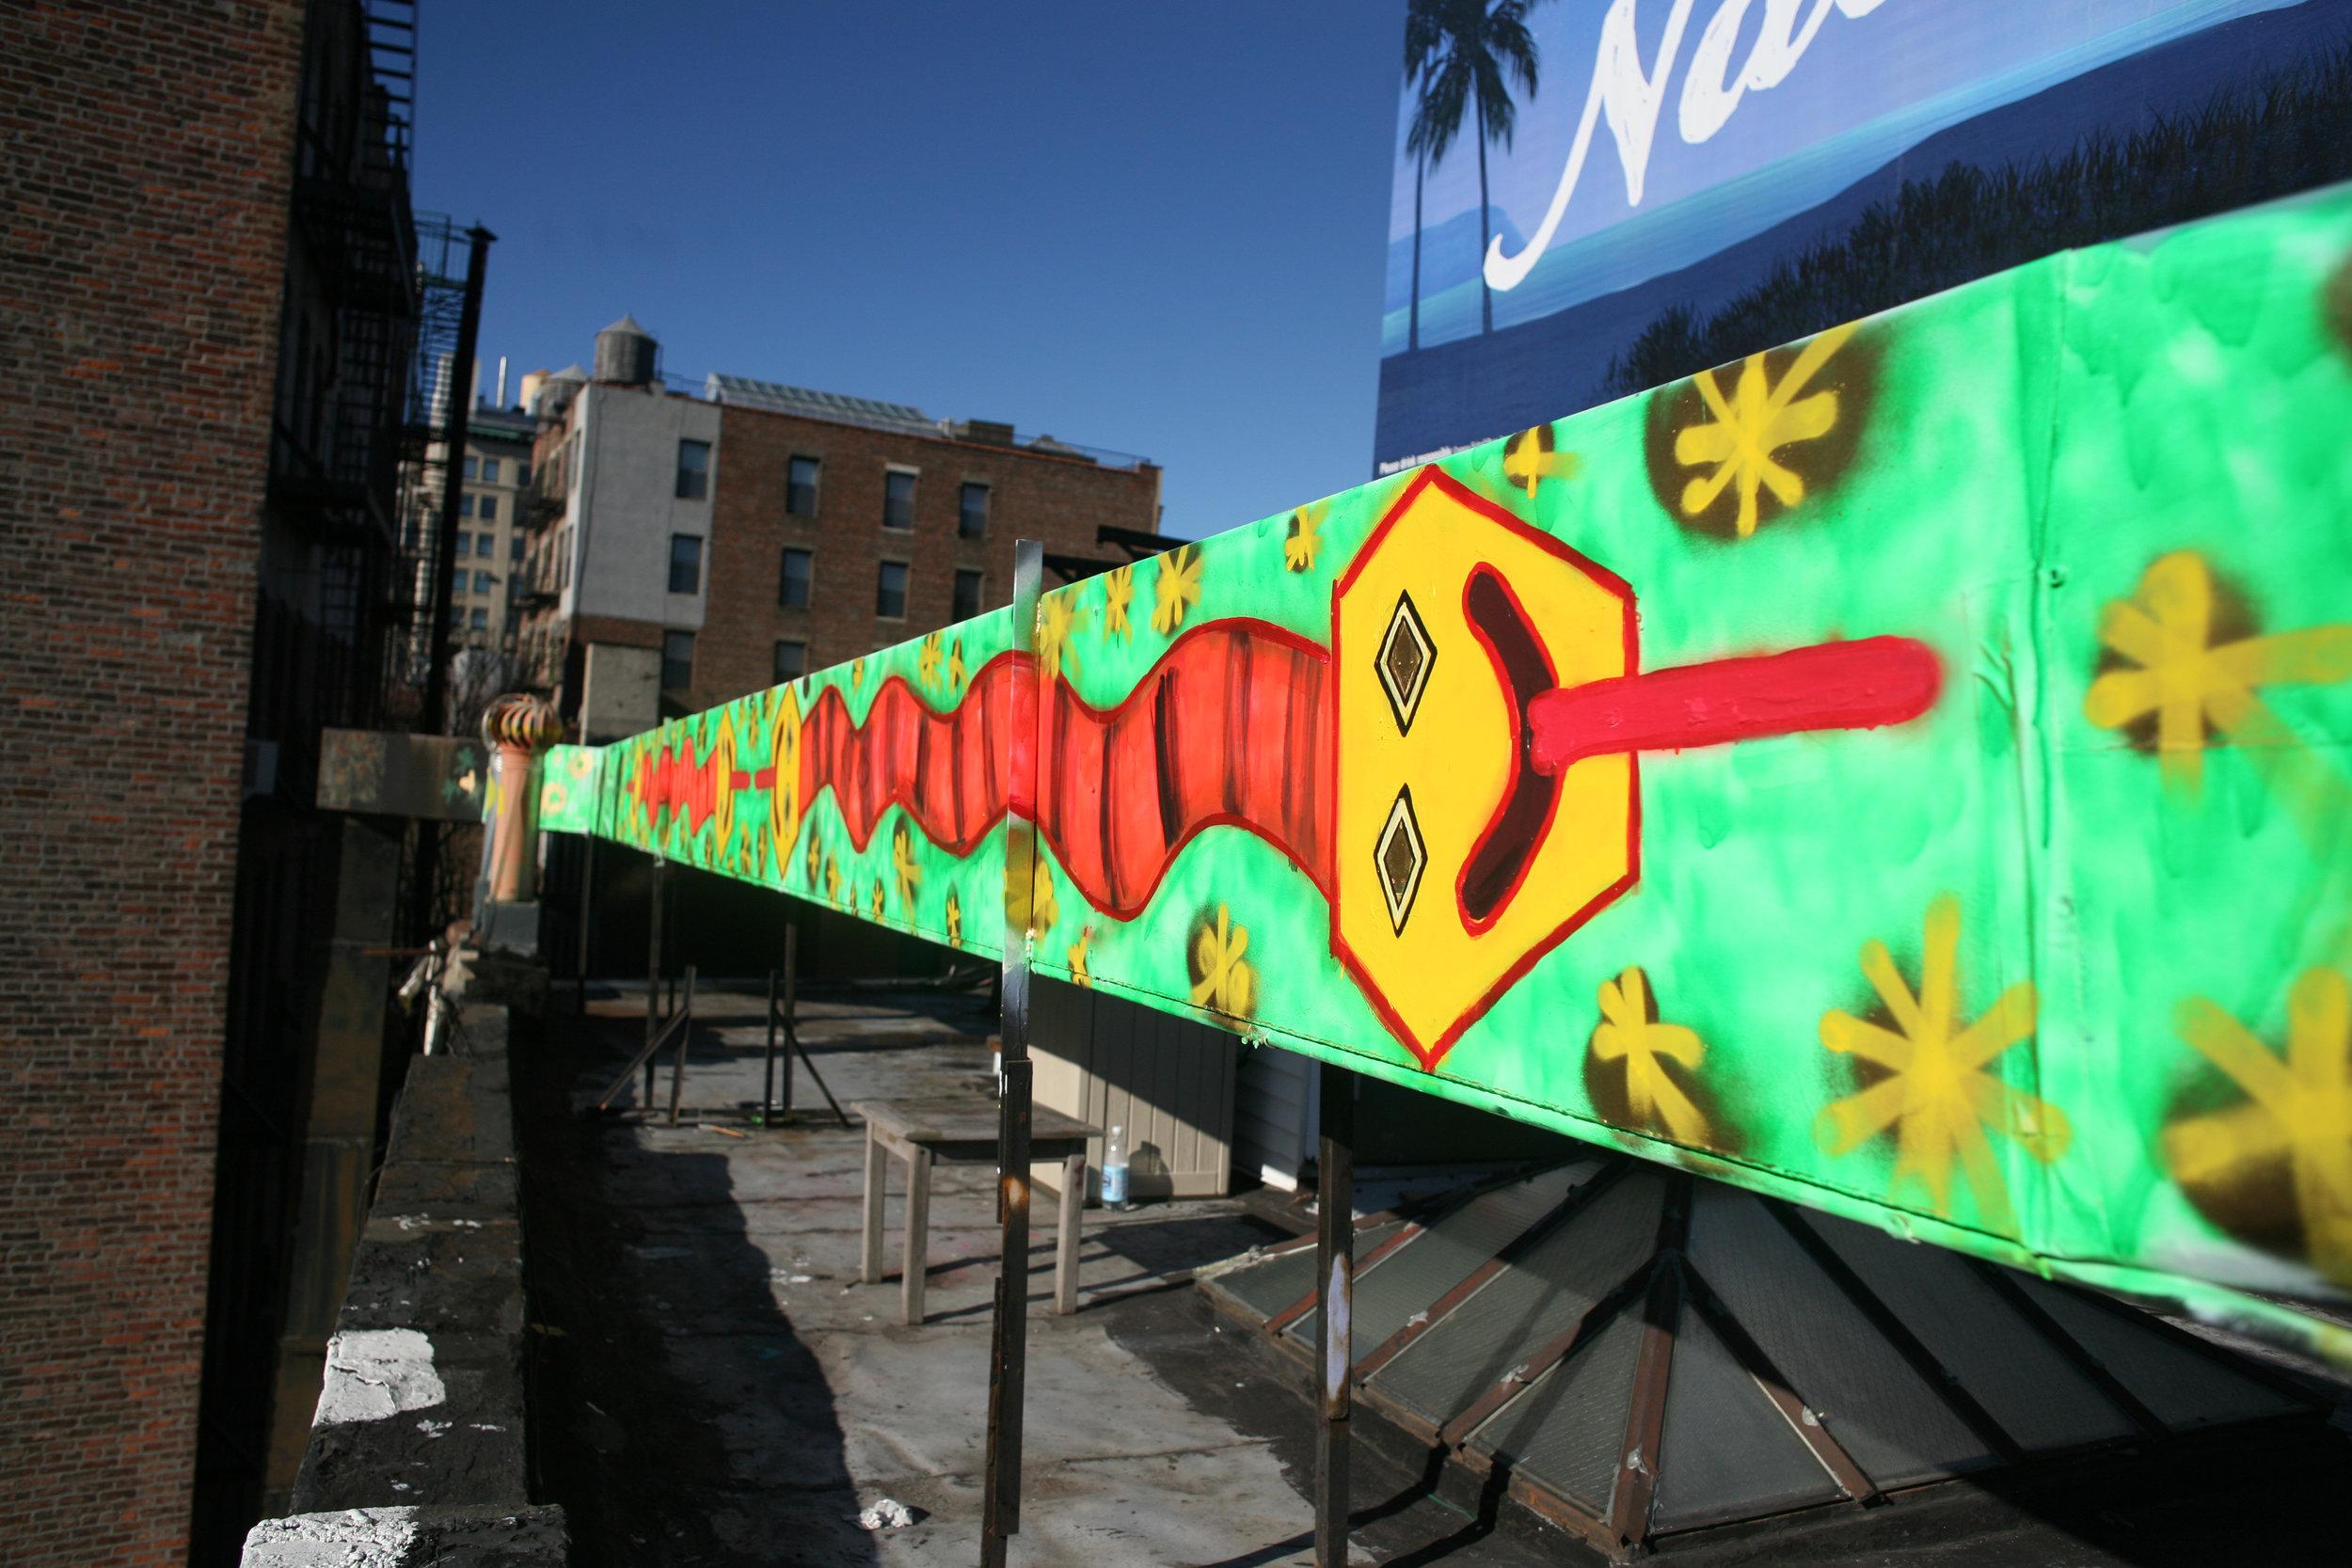 Cecilia-collantes-streetart-kulebra4.JPG